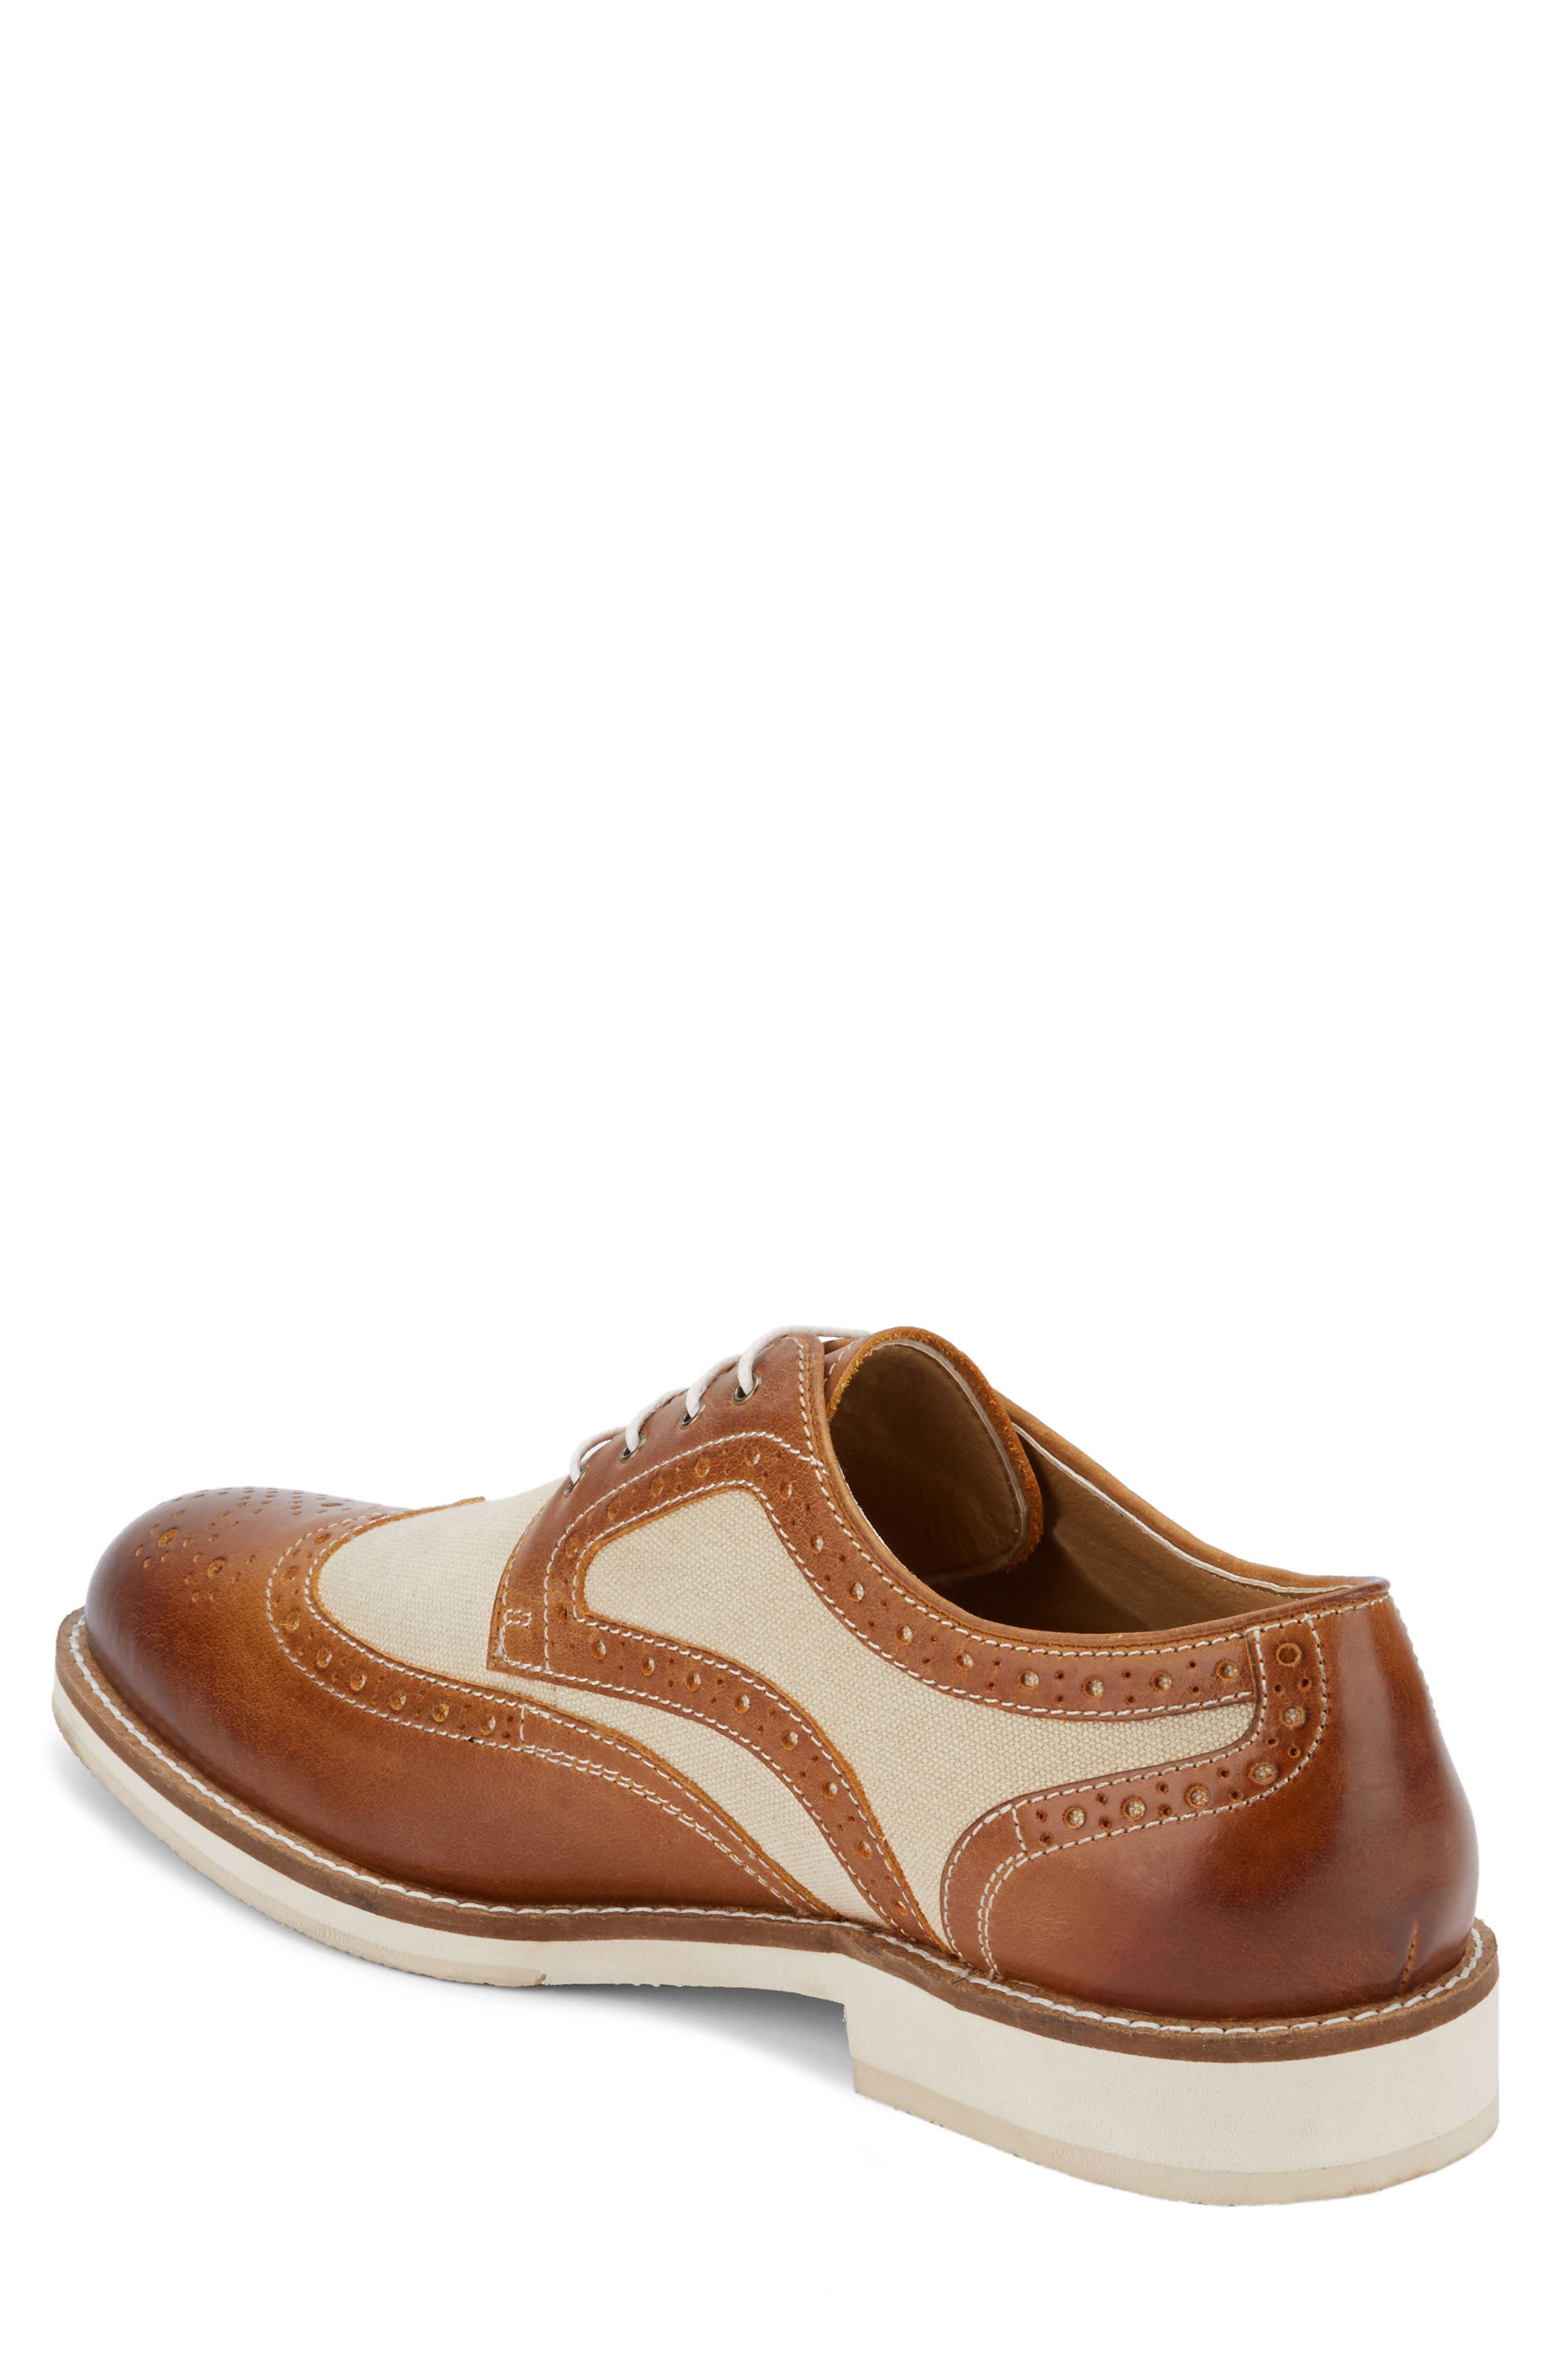 Alternate Image 2  - G.H. Bass & Co. Norman Spectator Shoe (Men)